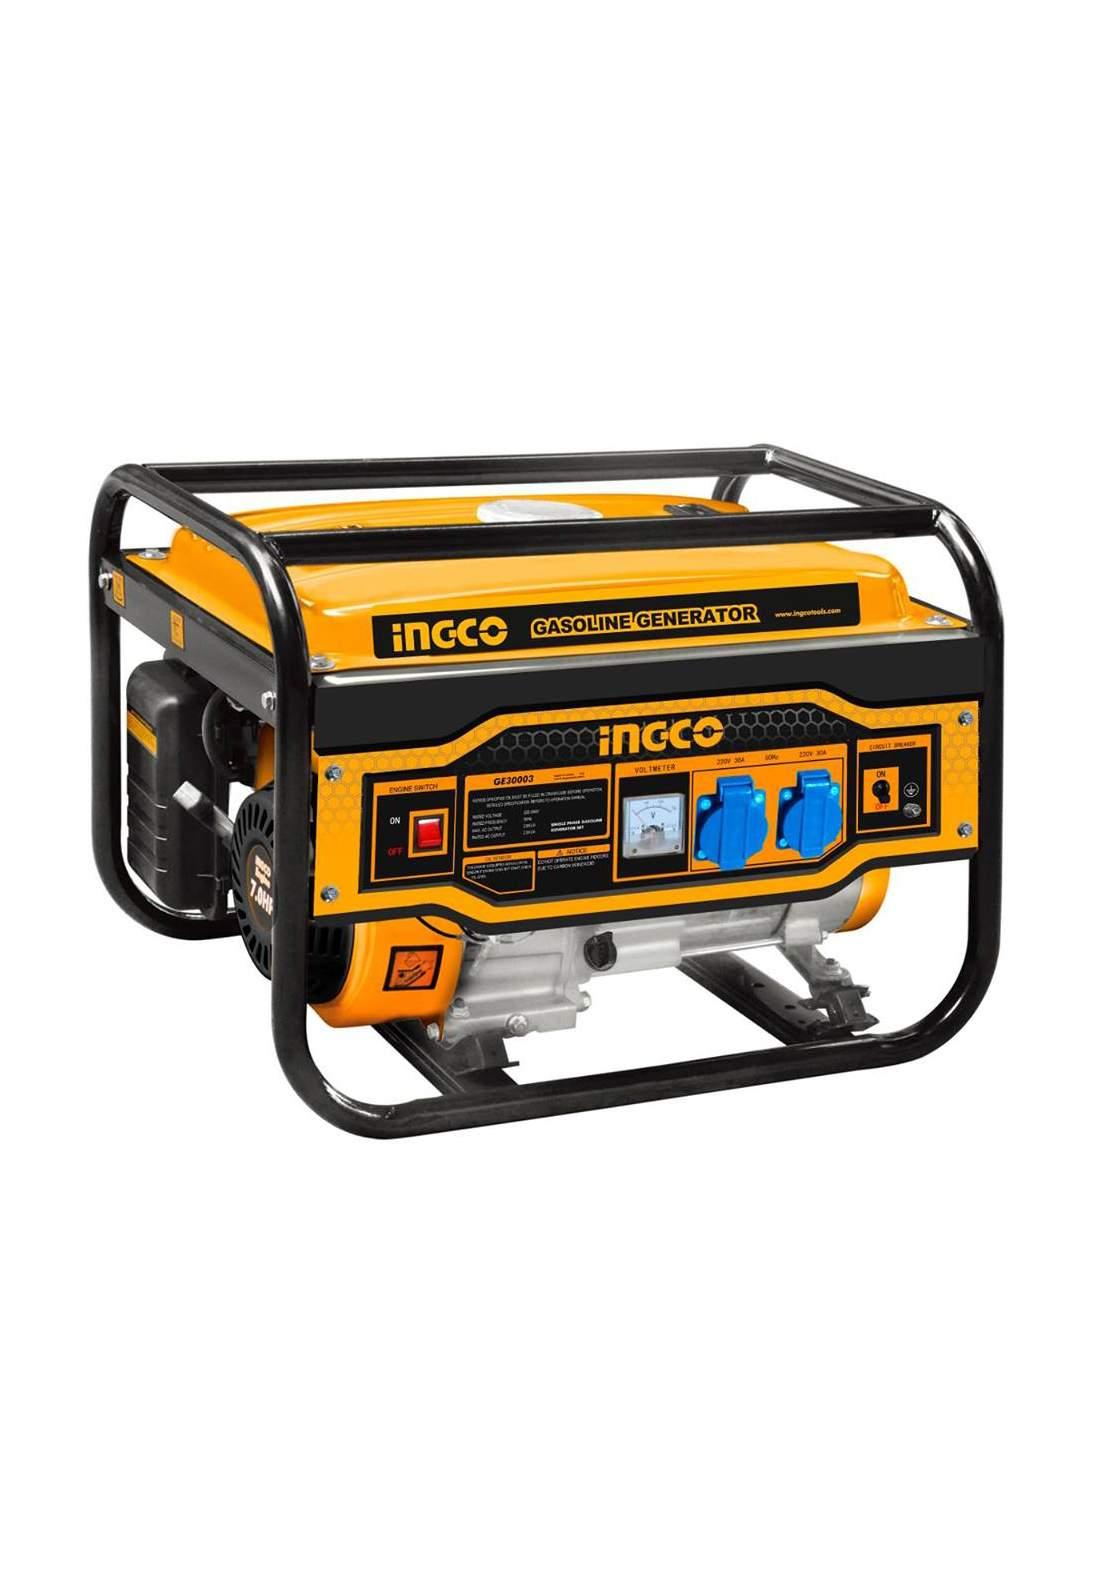 Ingco GE30003 Gasoline Generator 12 A 3000 W مولدة كهرباء هندر بانزين